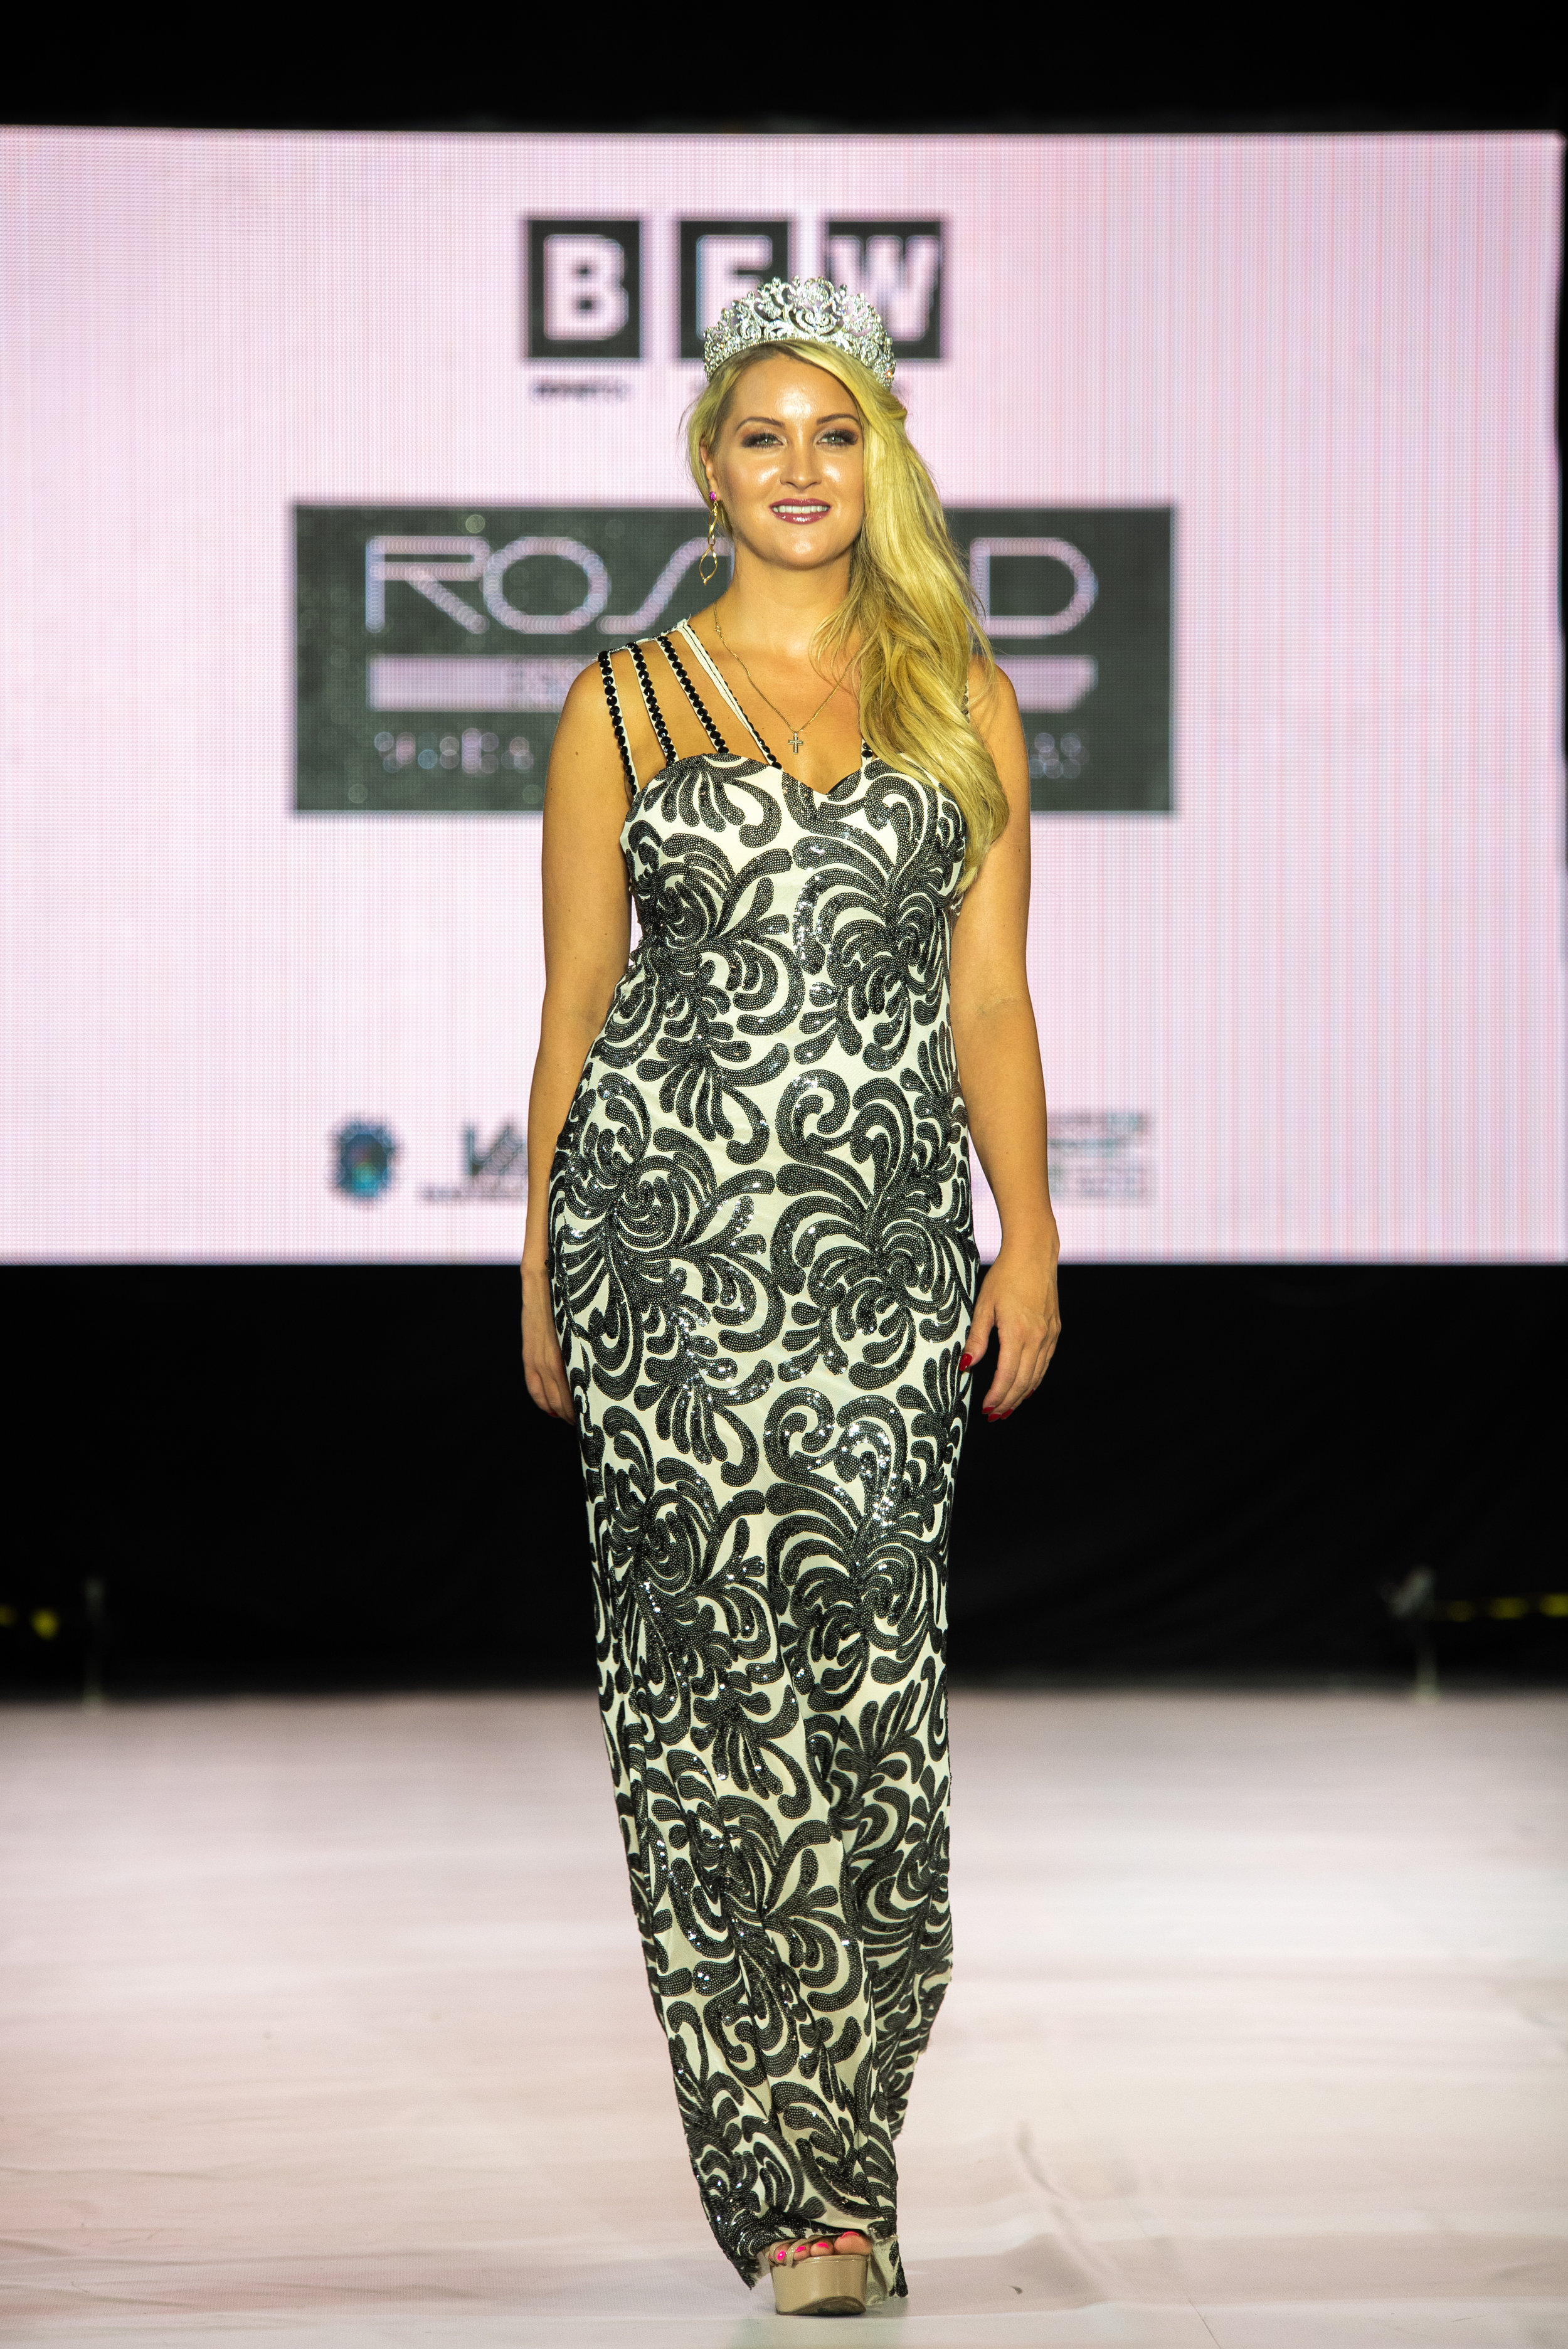 BFW10 - Rosred Fashion Design-SKN_5062.jpg